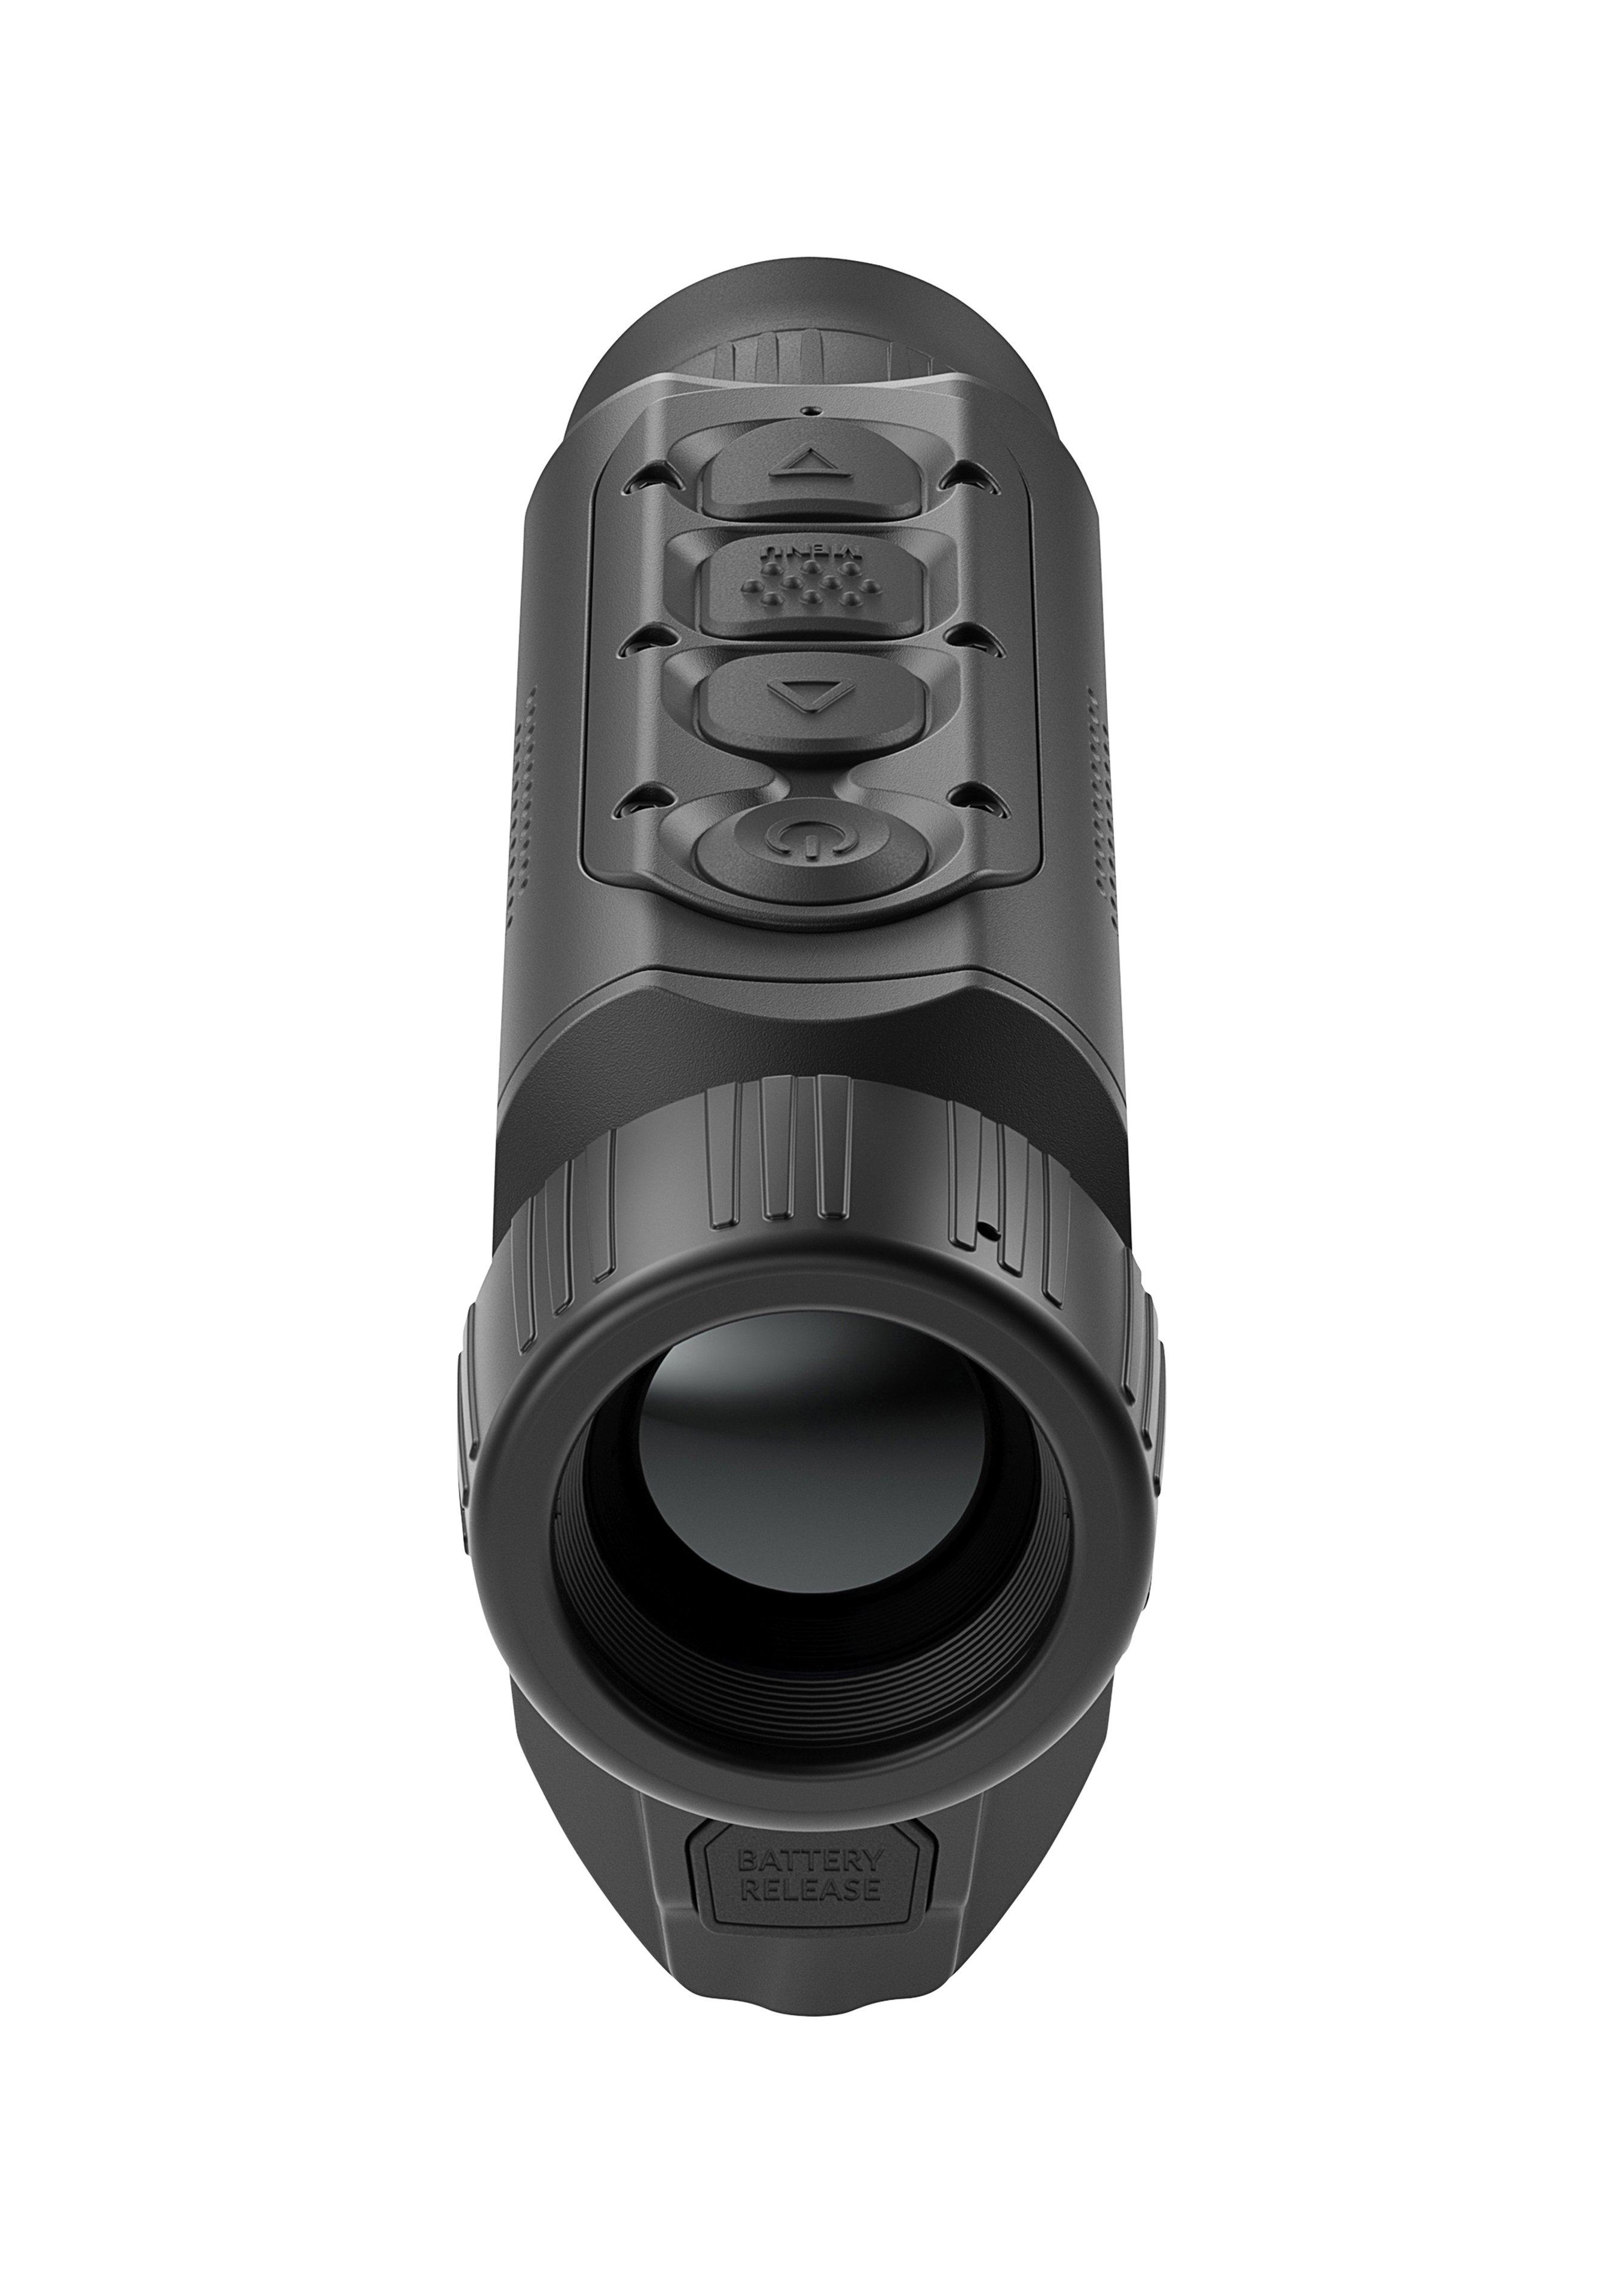 Caméra thermique Axion Key XM 30 244310 3